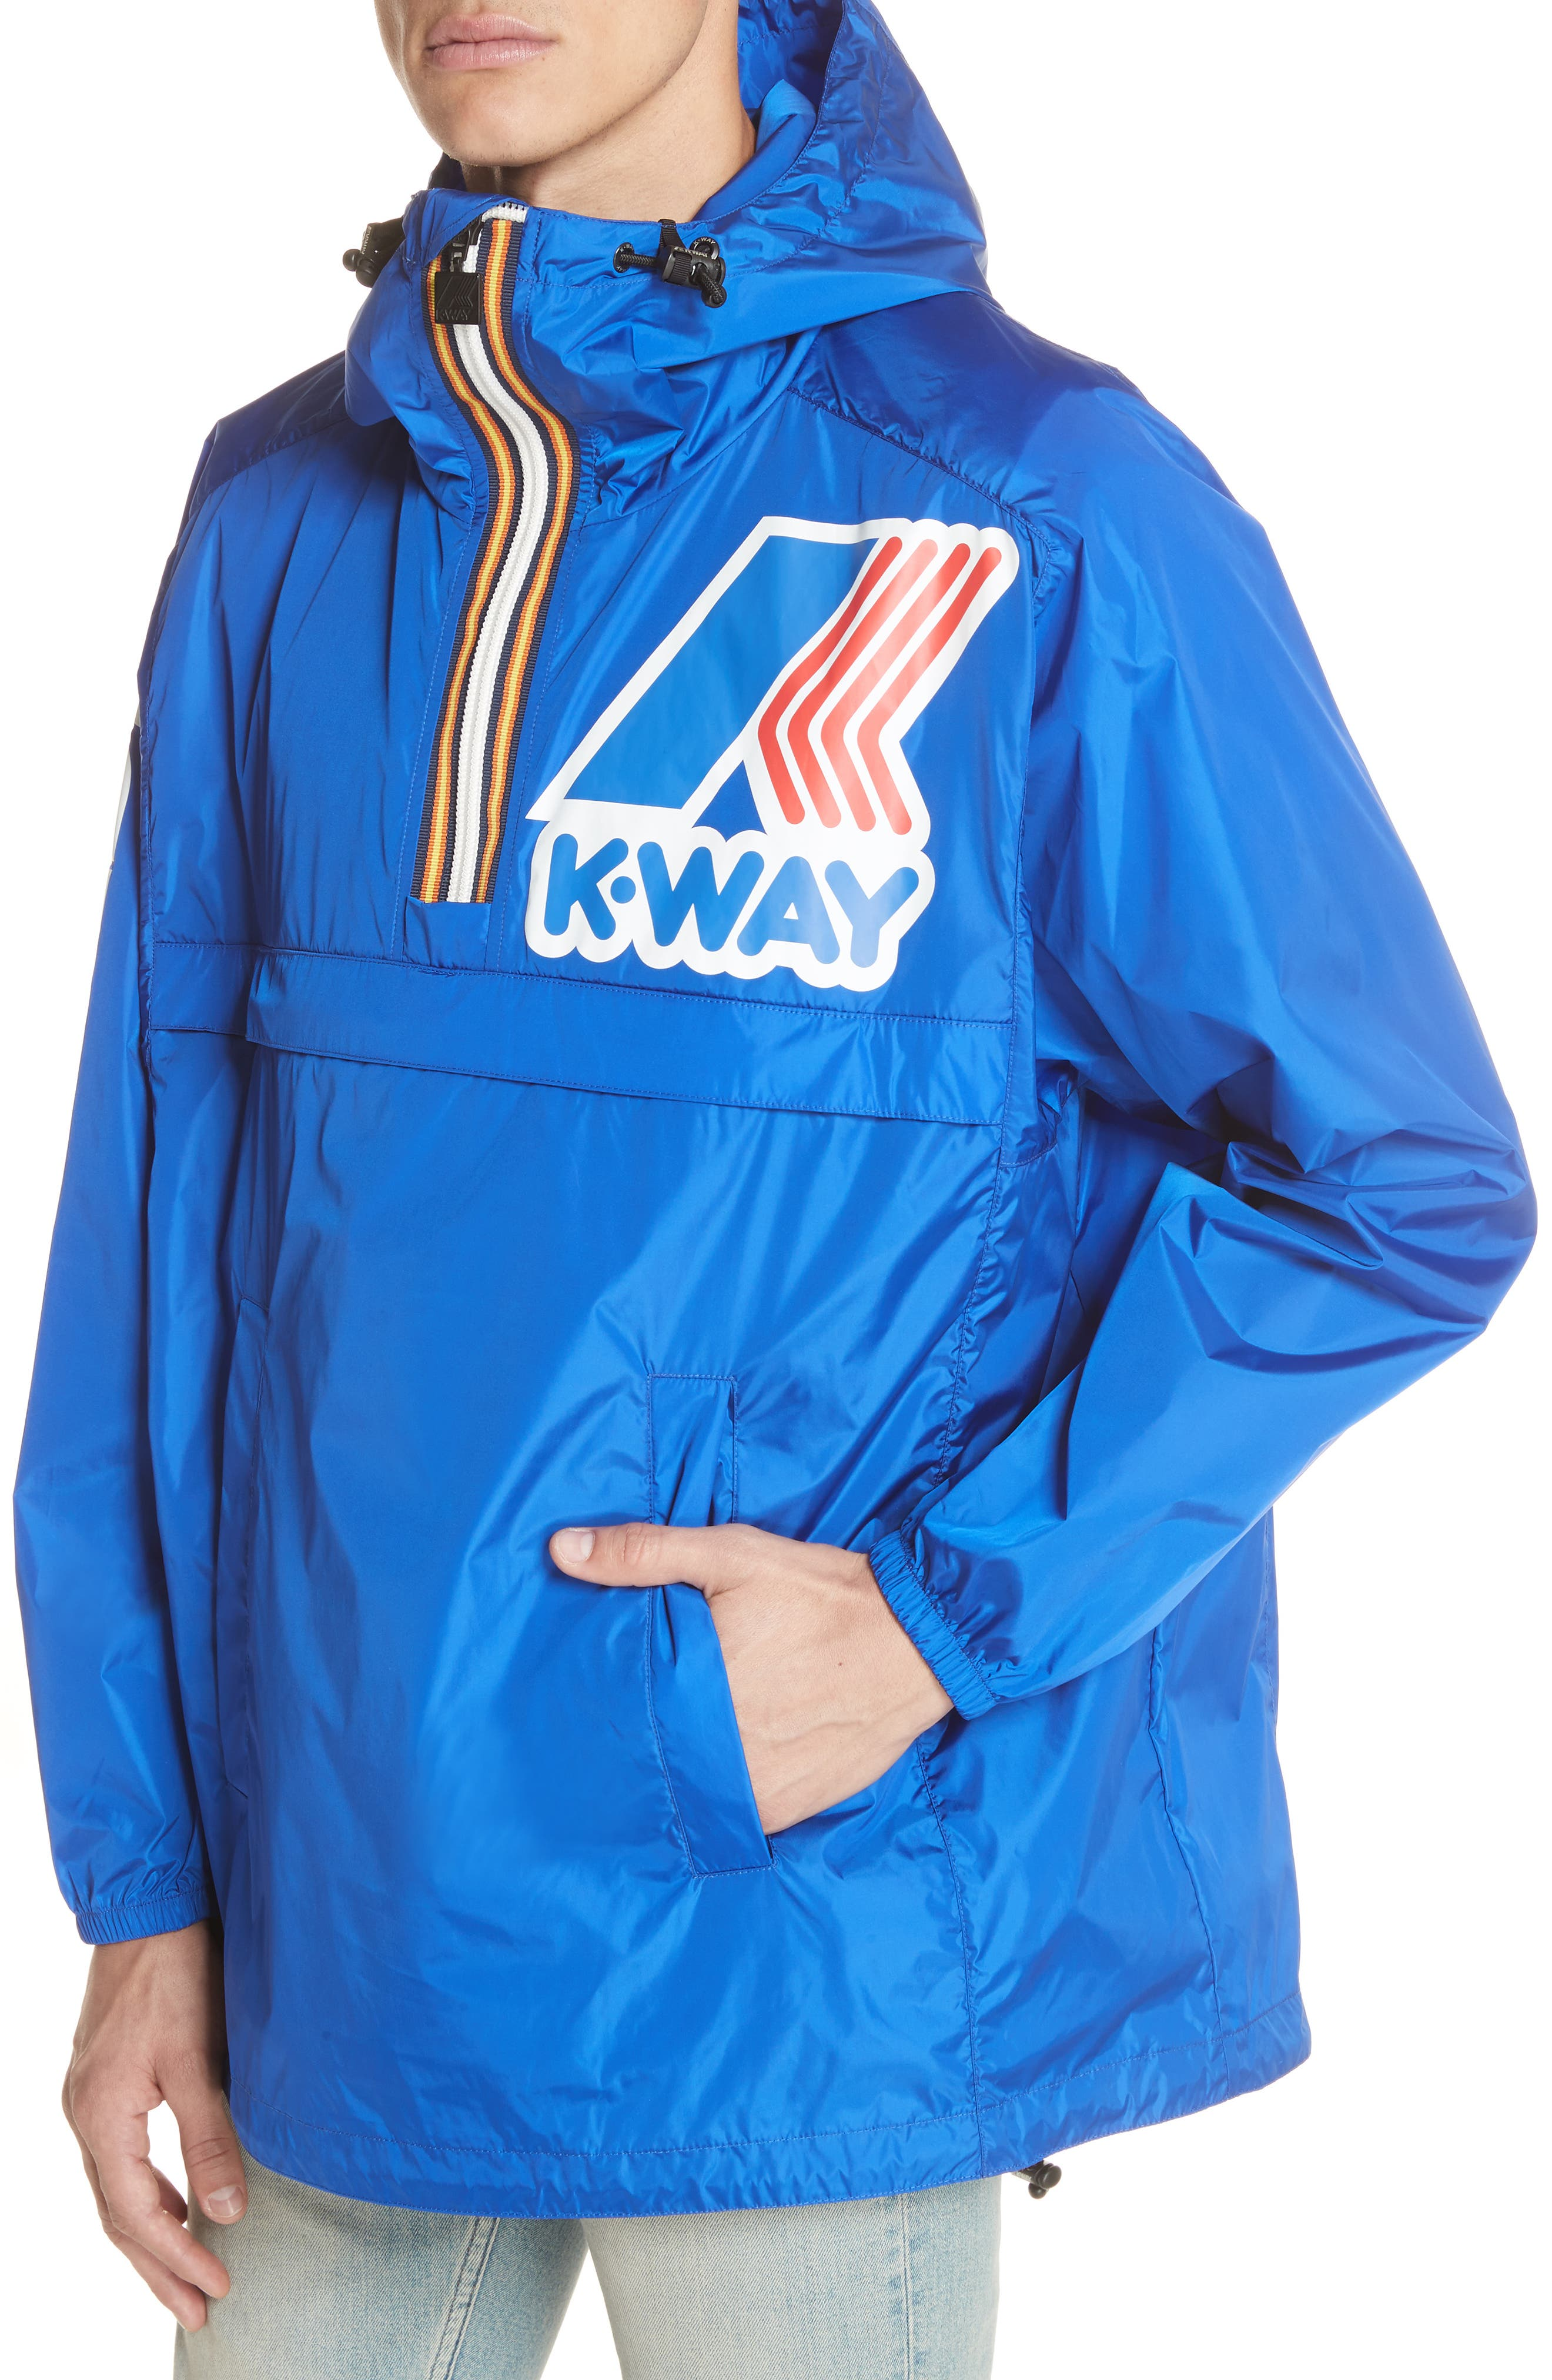 x K-Way Windbreaker,                             Alternate thumbnail 4, color,                             Light/Blue